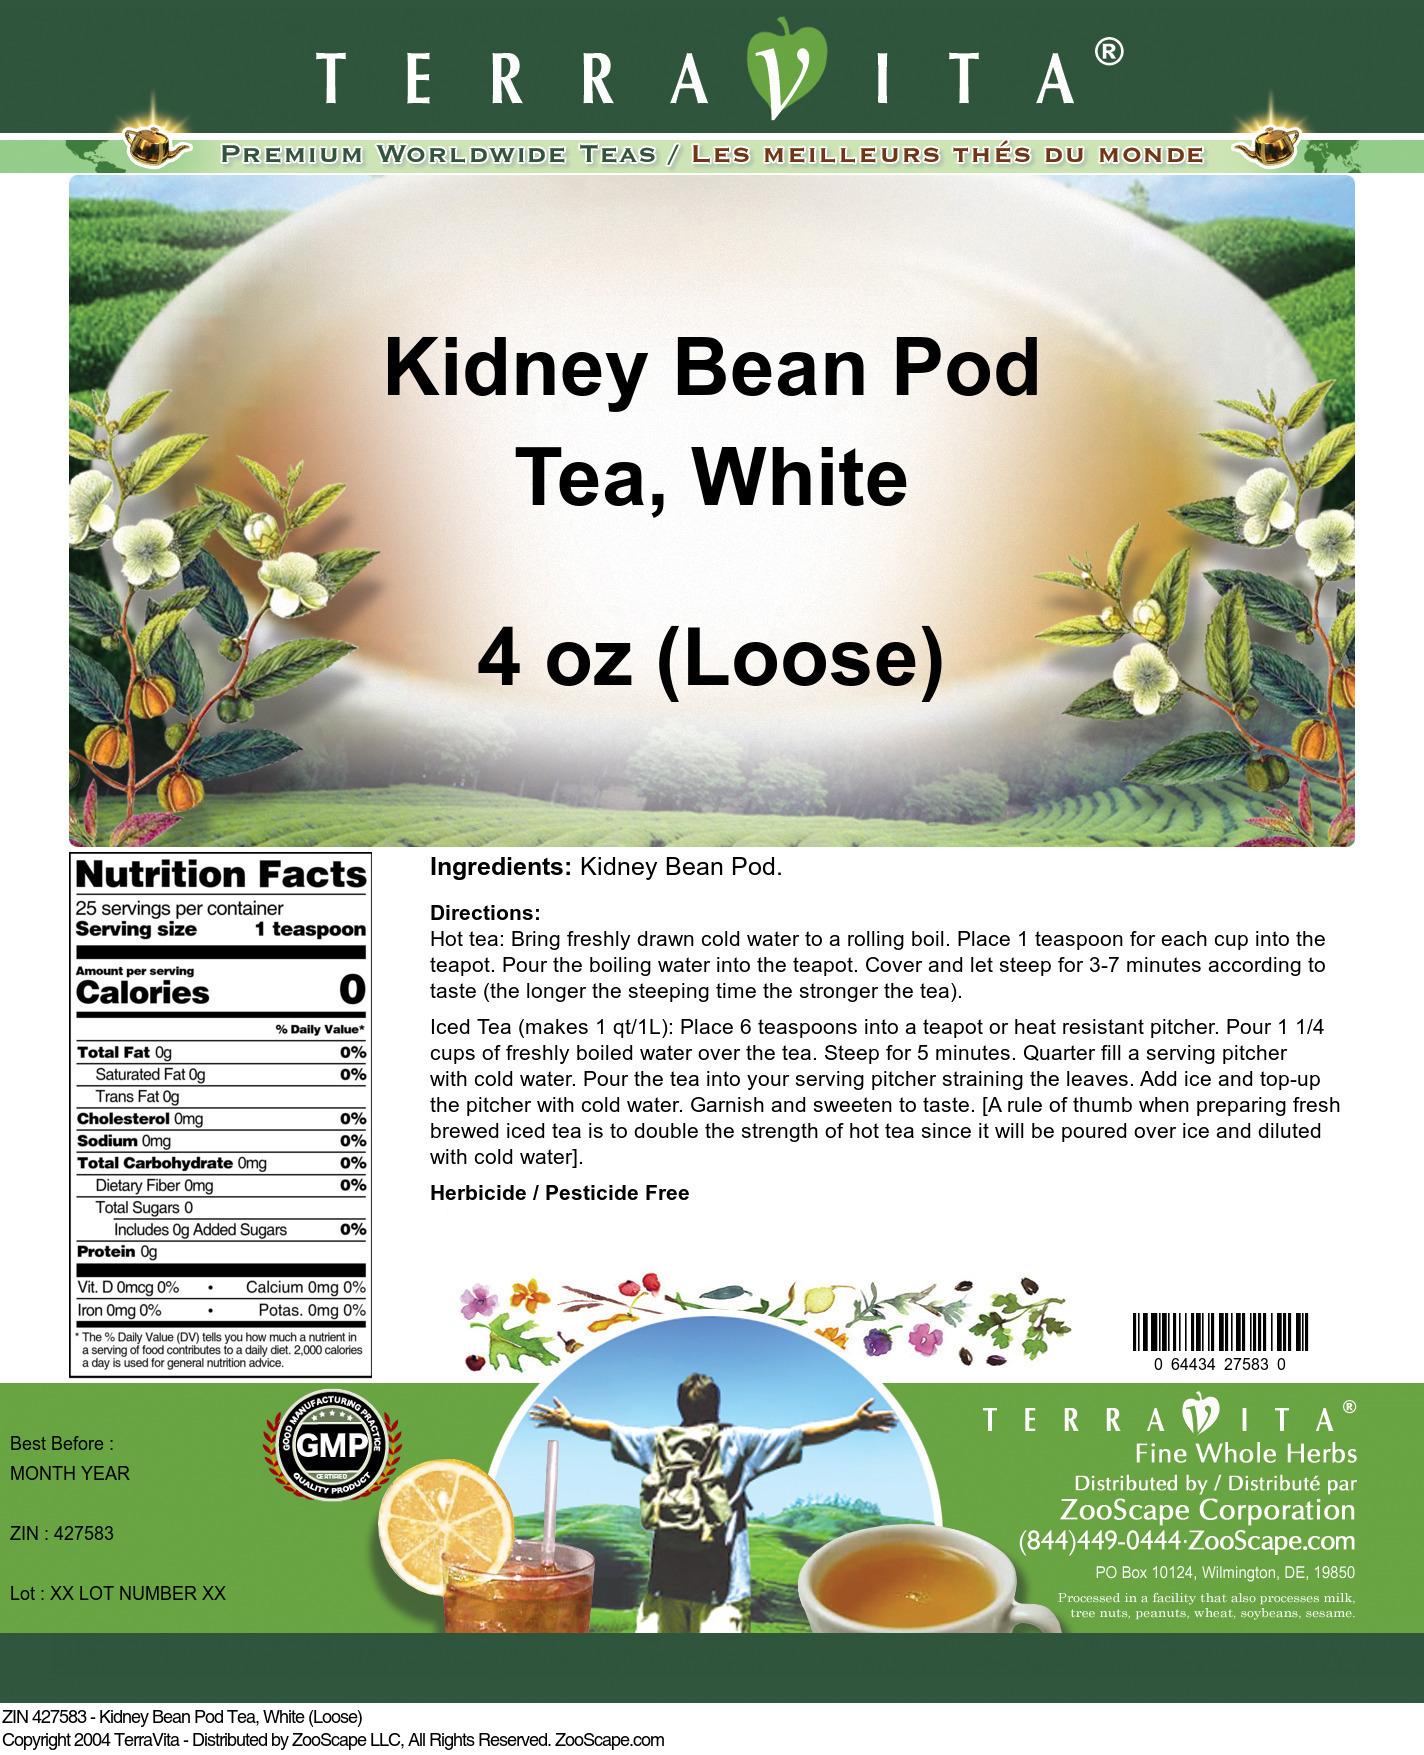 Kidney Bean Pod Tea, White (Loose)